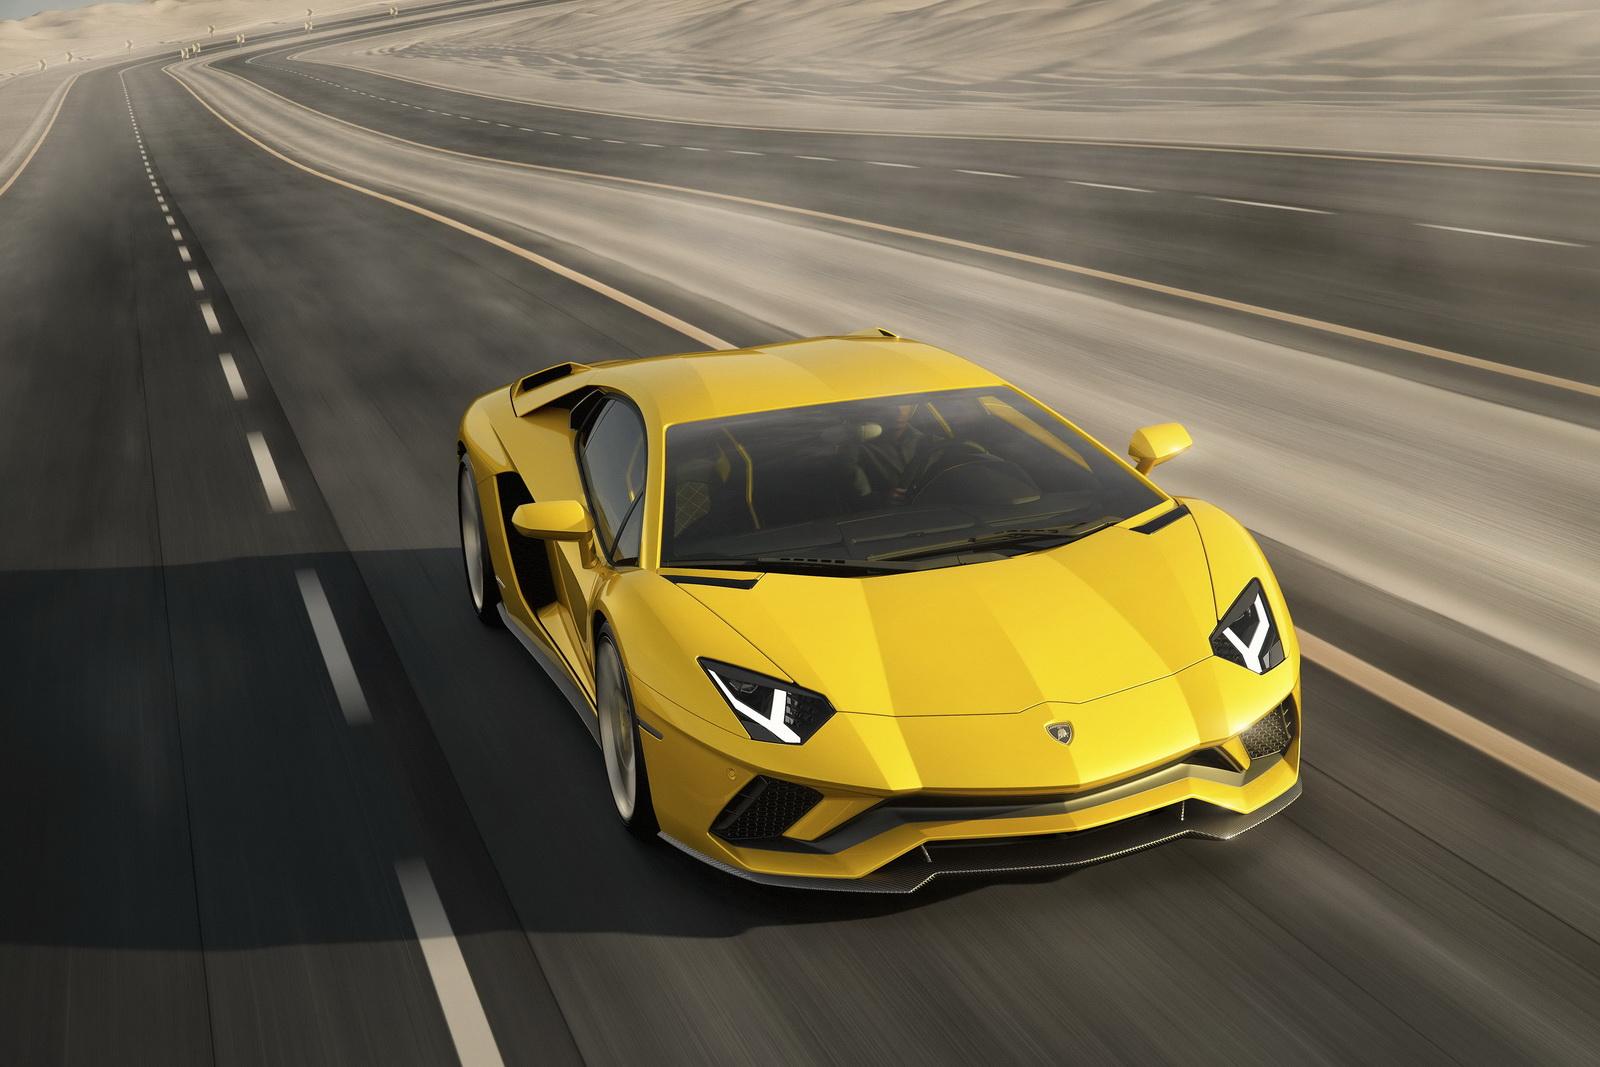 Lamborghini-Aventador-S-Coupé-1